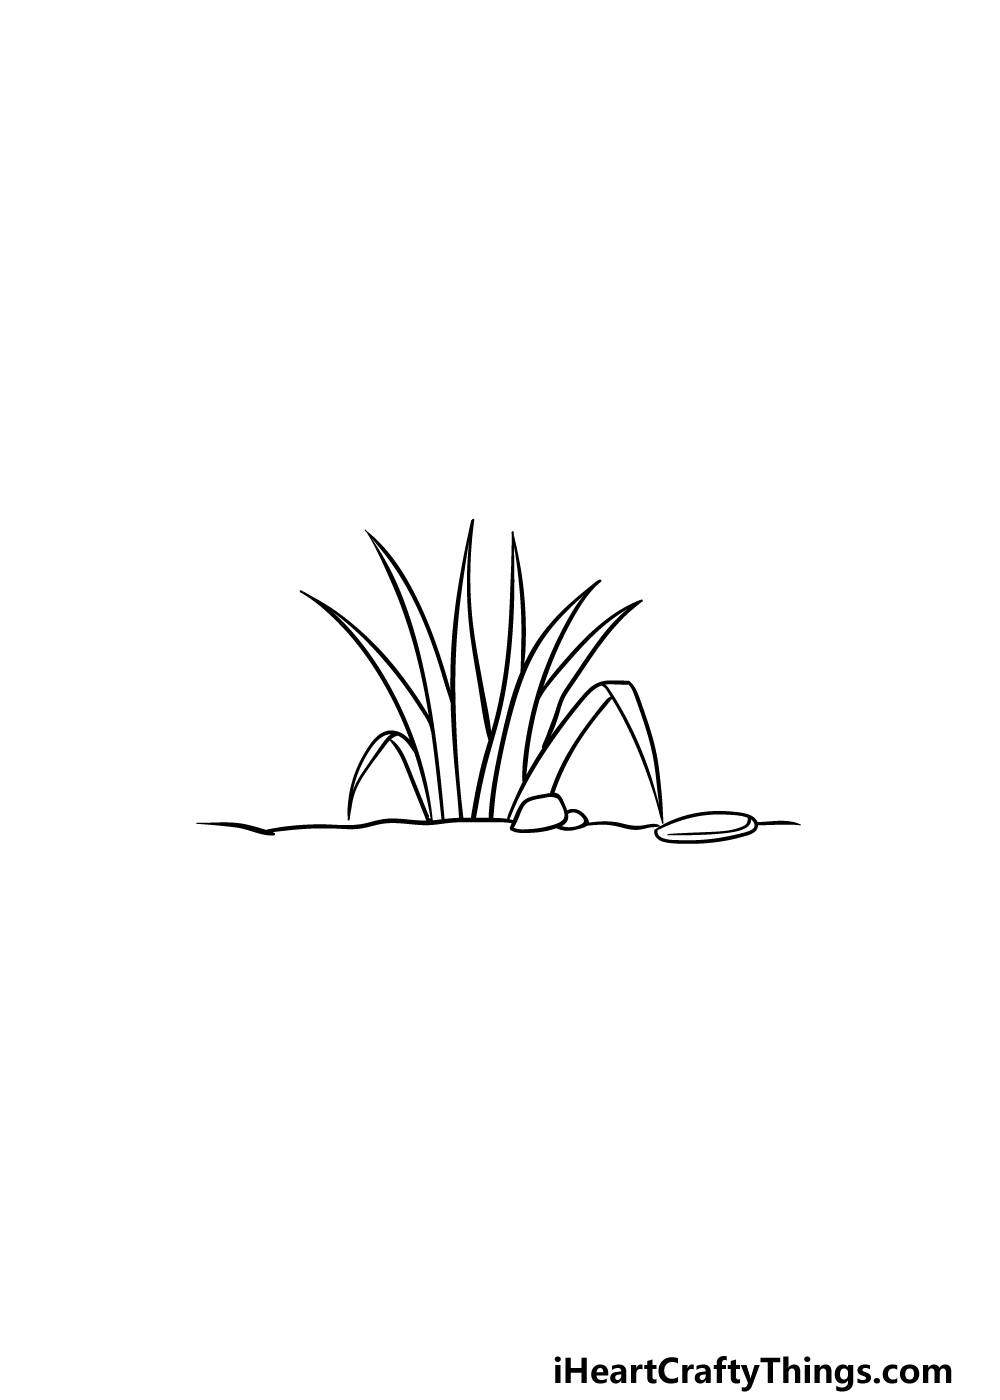 drawing grass step 3